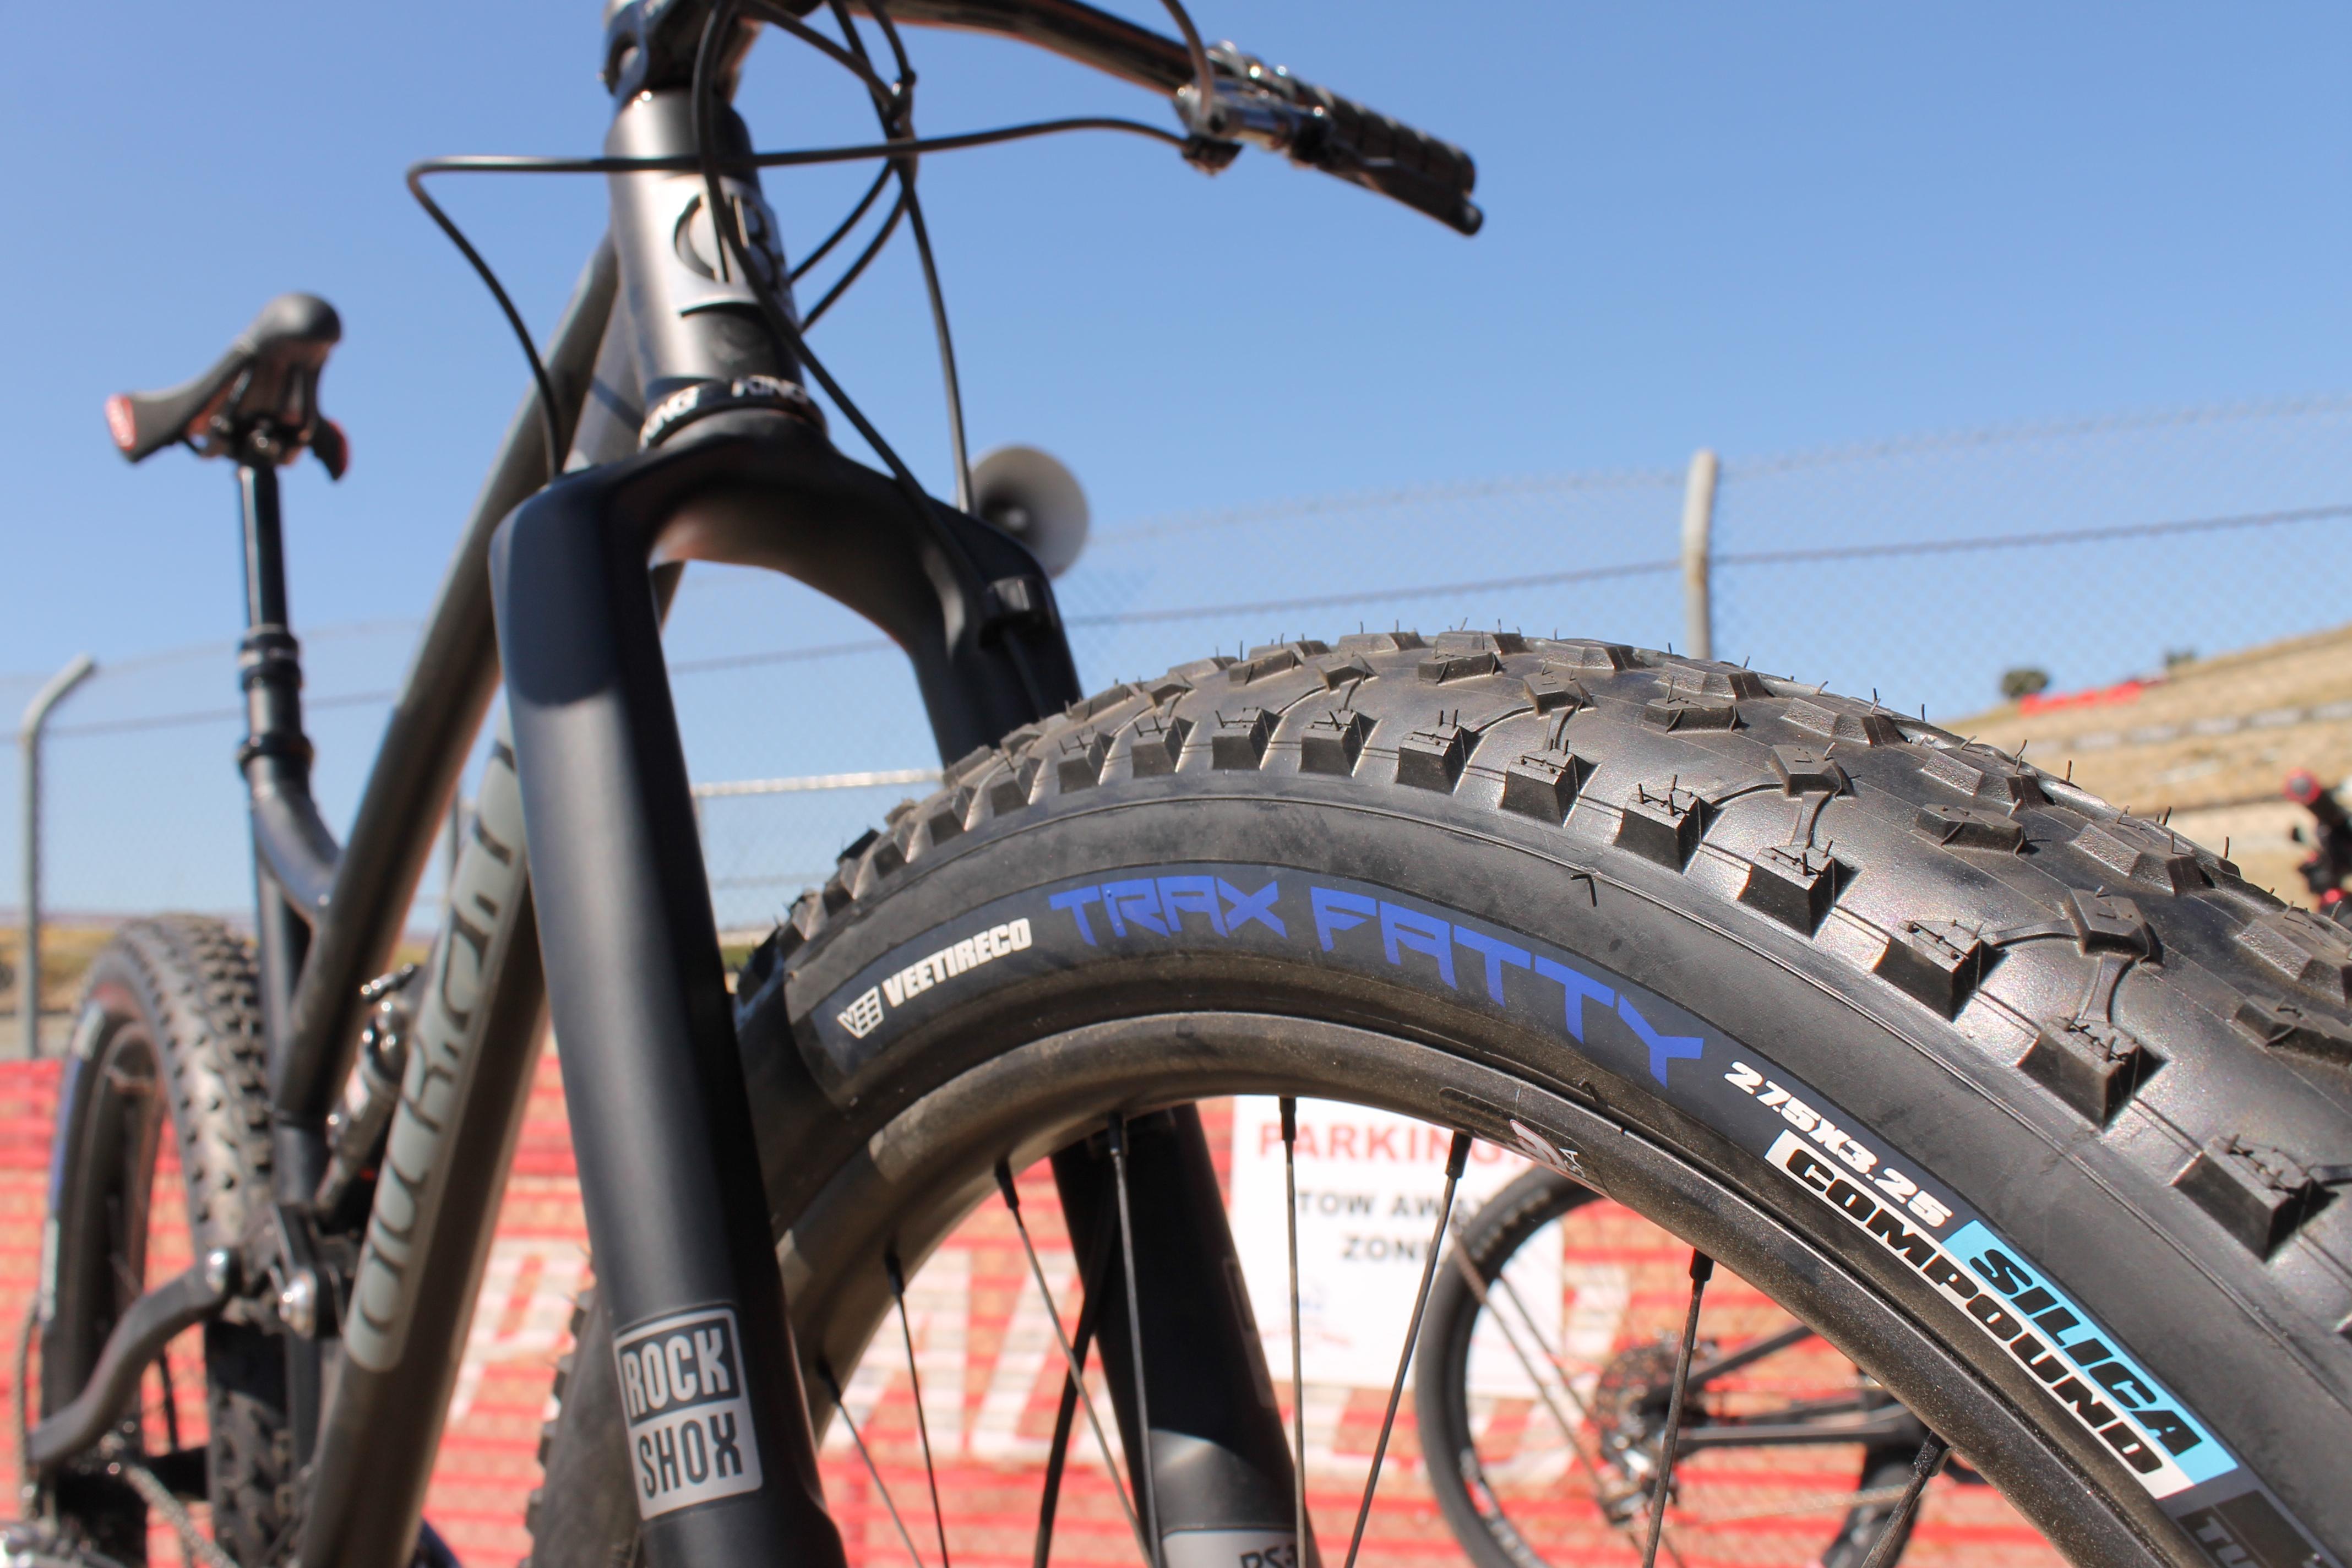 Durango bike company blackjack